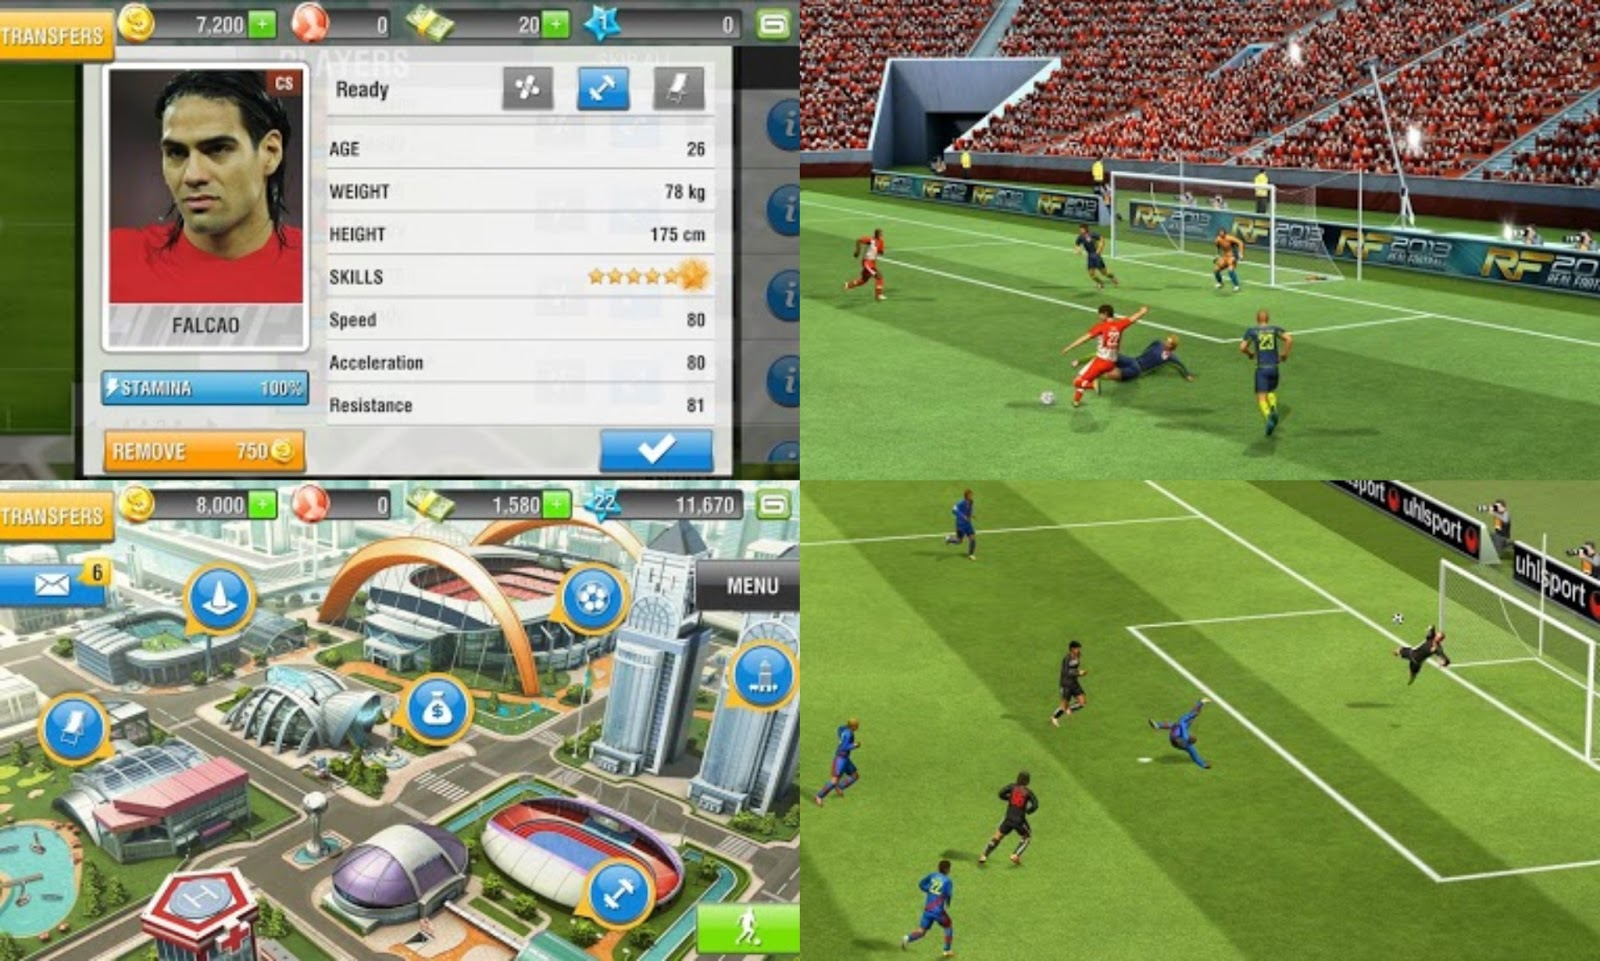 Rf Real Football 2013 V1 0 3 Apk Sd Data Android